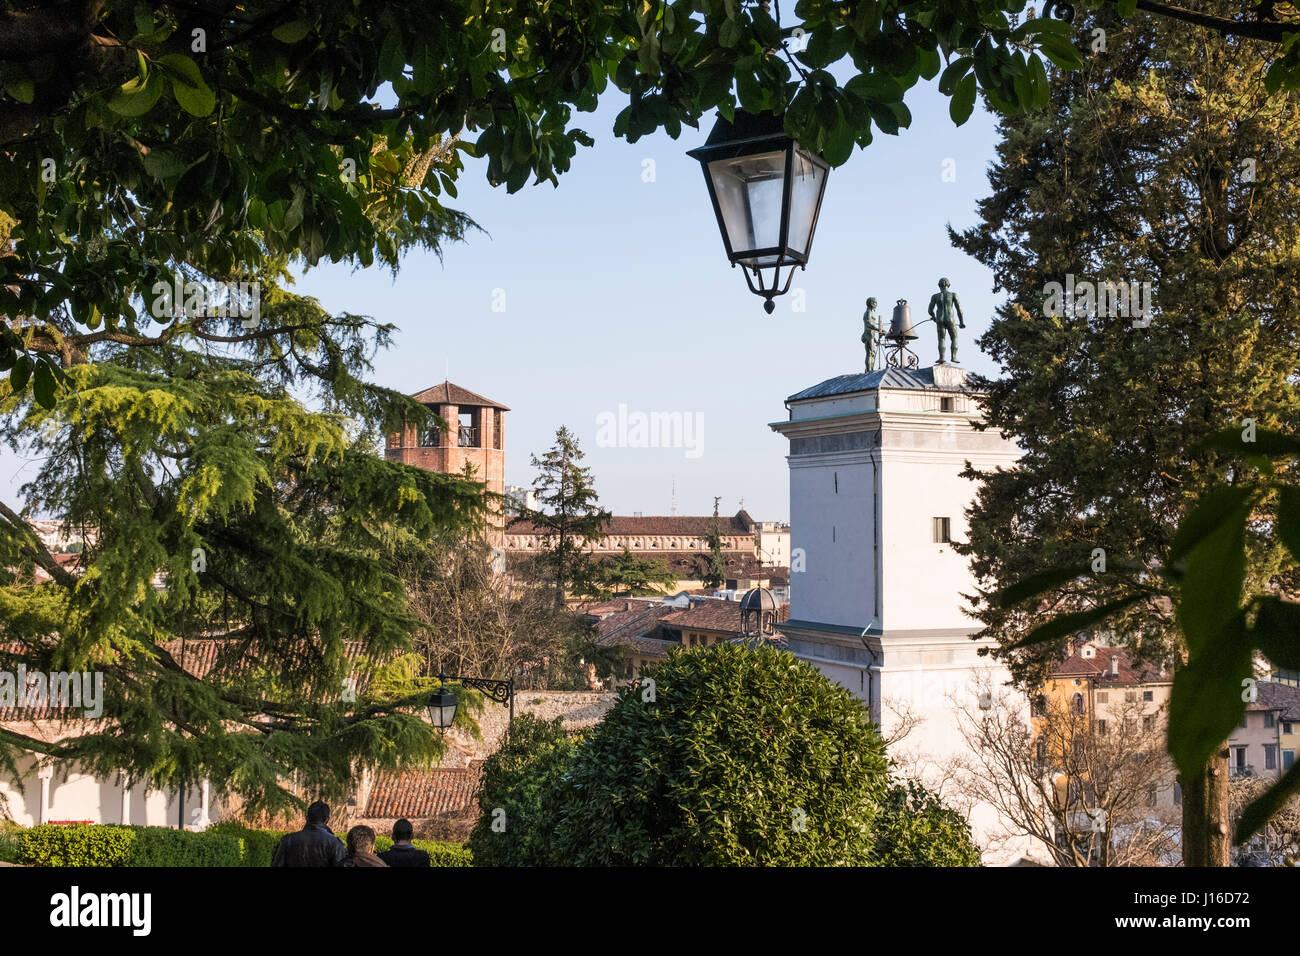 Statues with clock on Loggia di San Giovanni in Udine, Italy - Stock Image